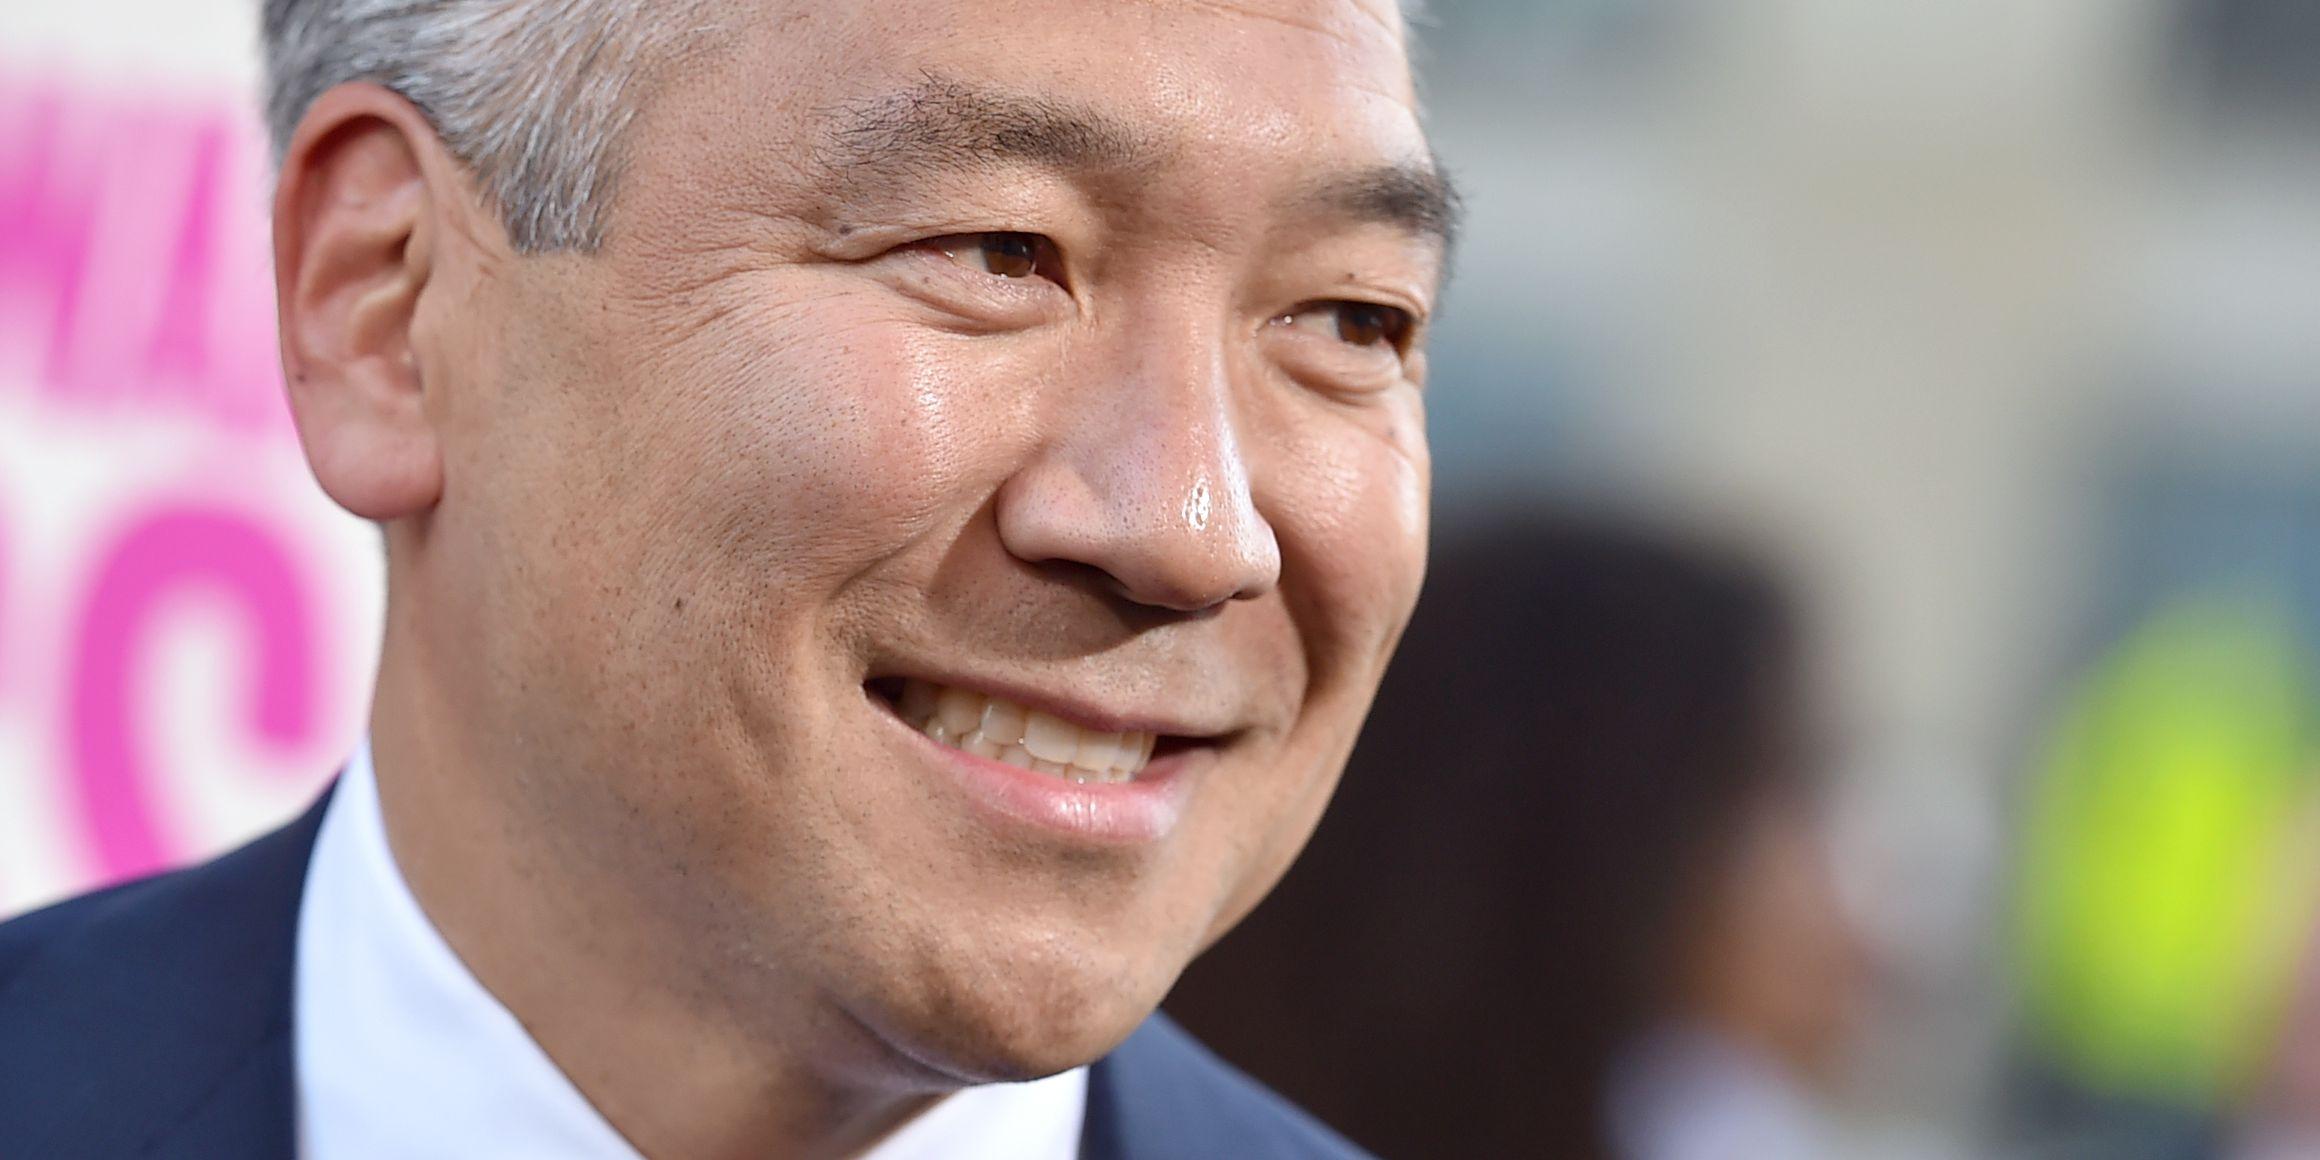 Warner Bros. CEO Tsujihara steps down following allegations of sex scandal